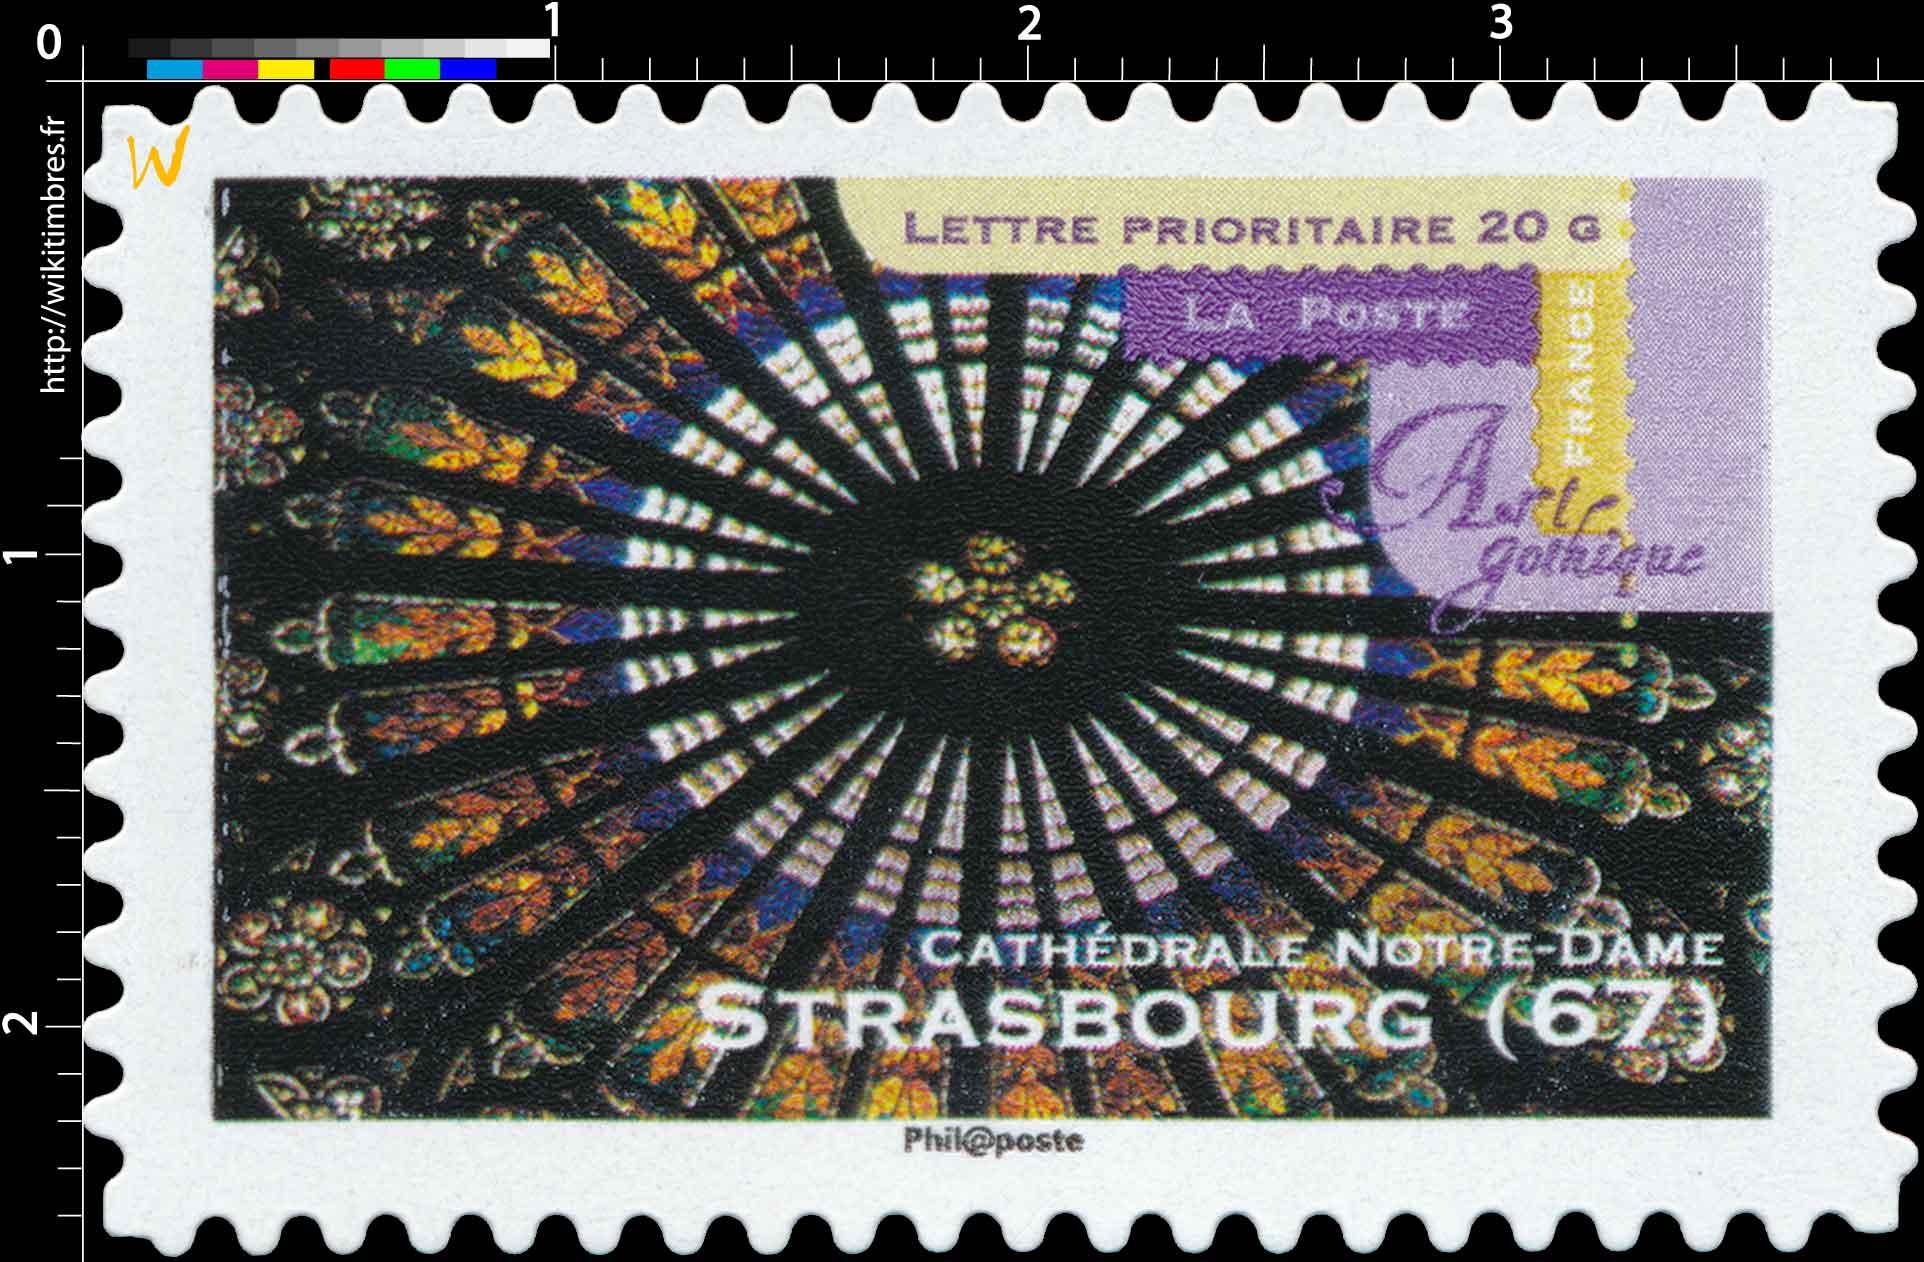 Art gothique cathédrale Notre-Dame Strasbourg (67)